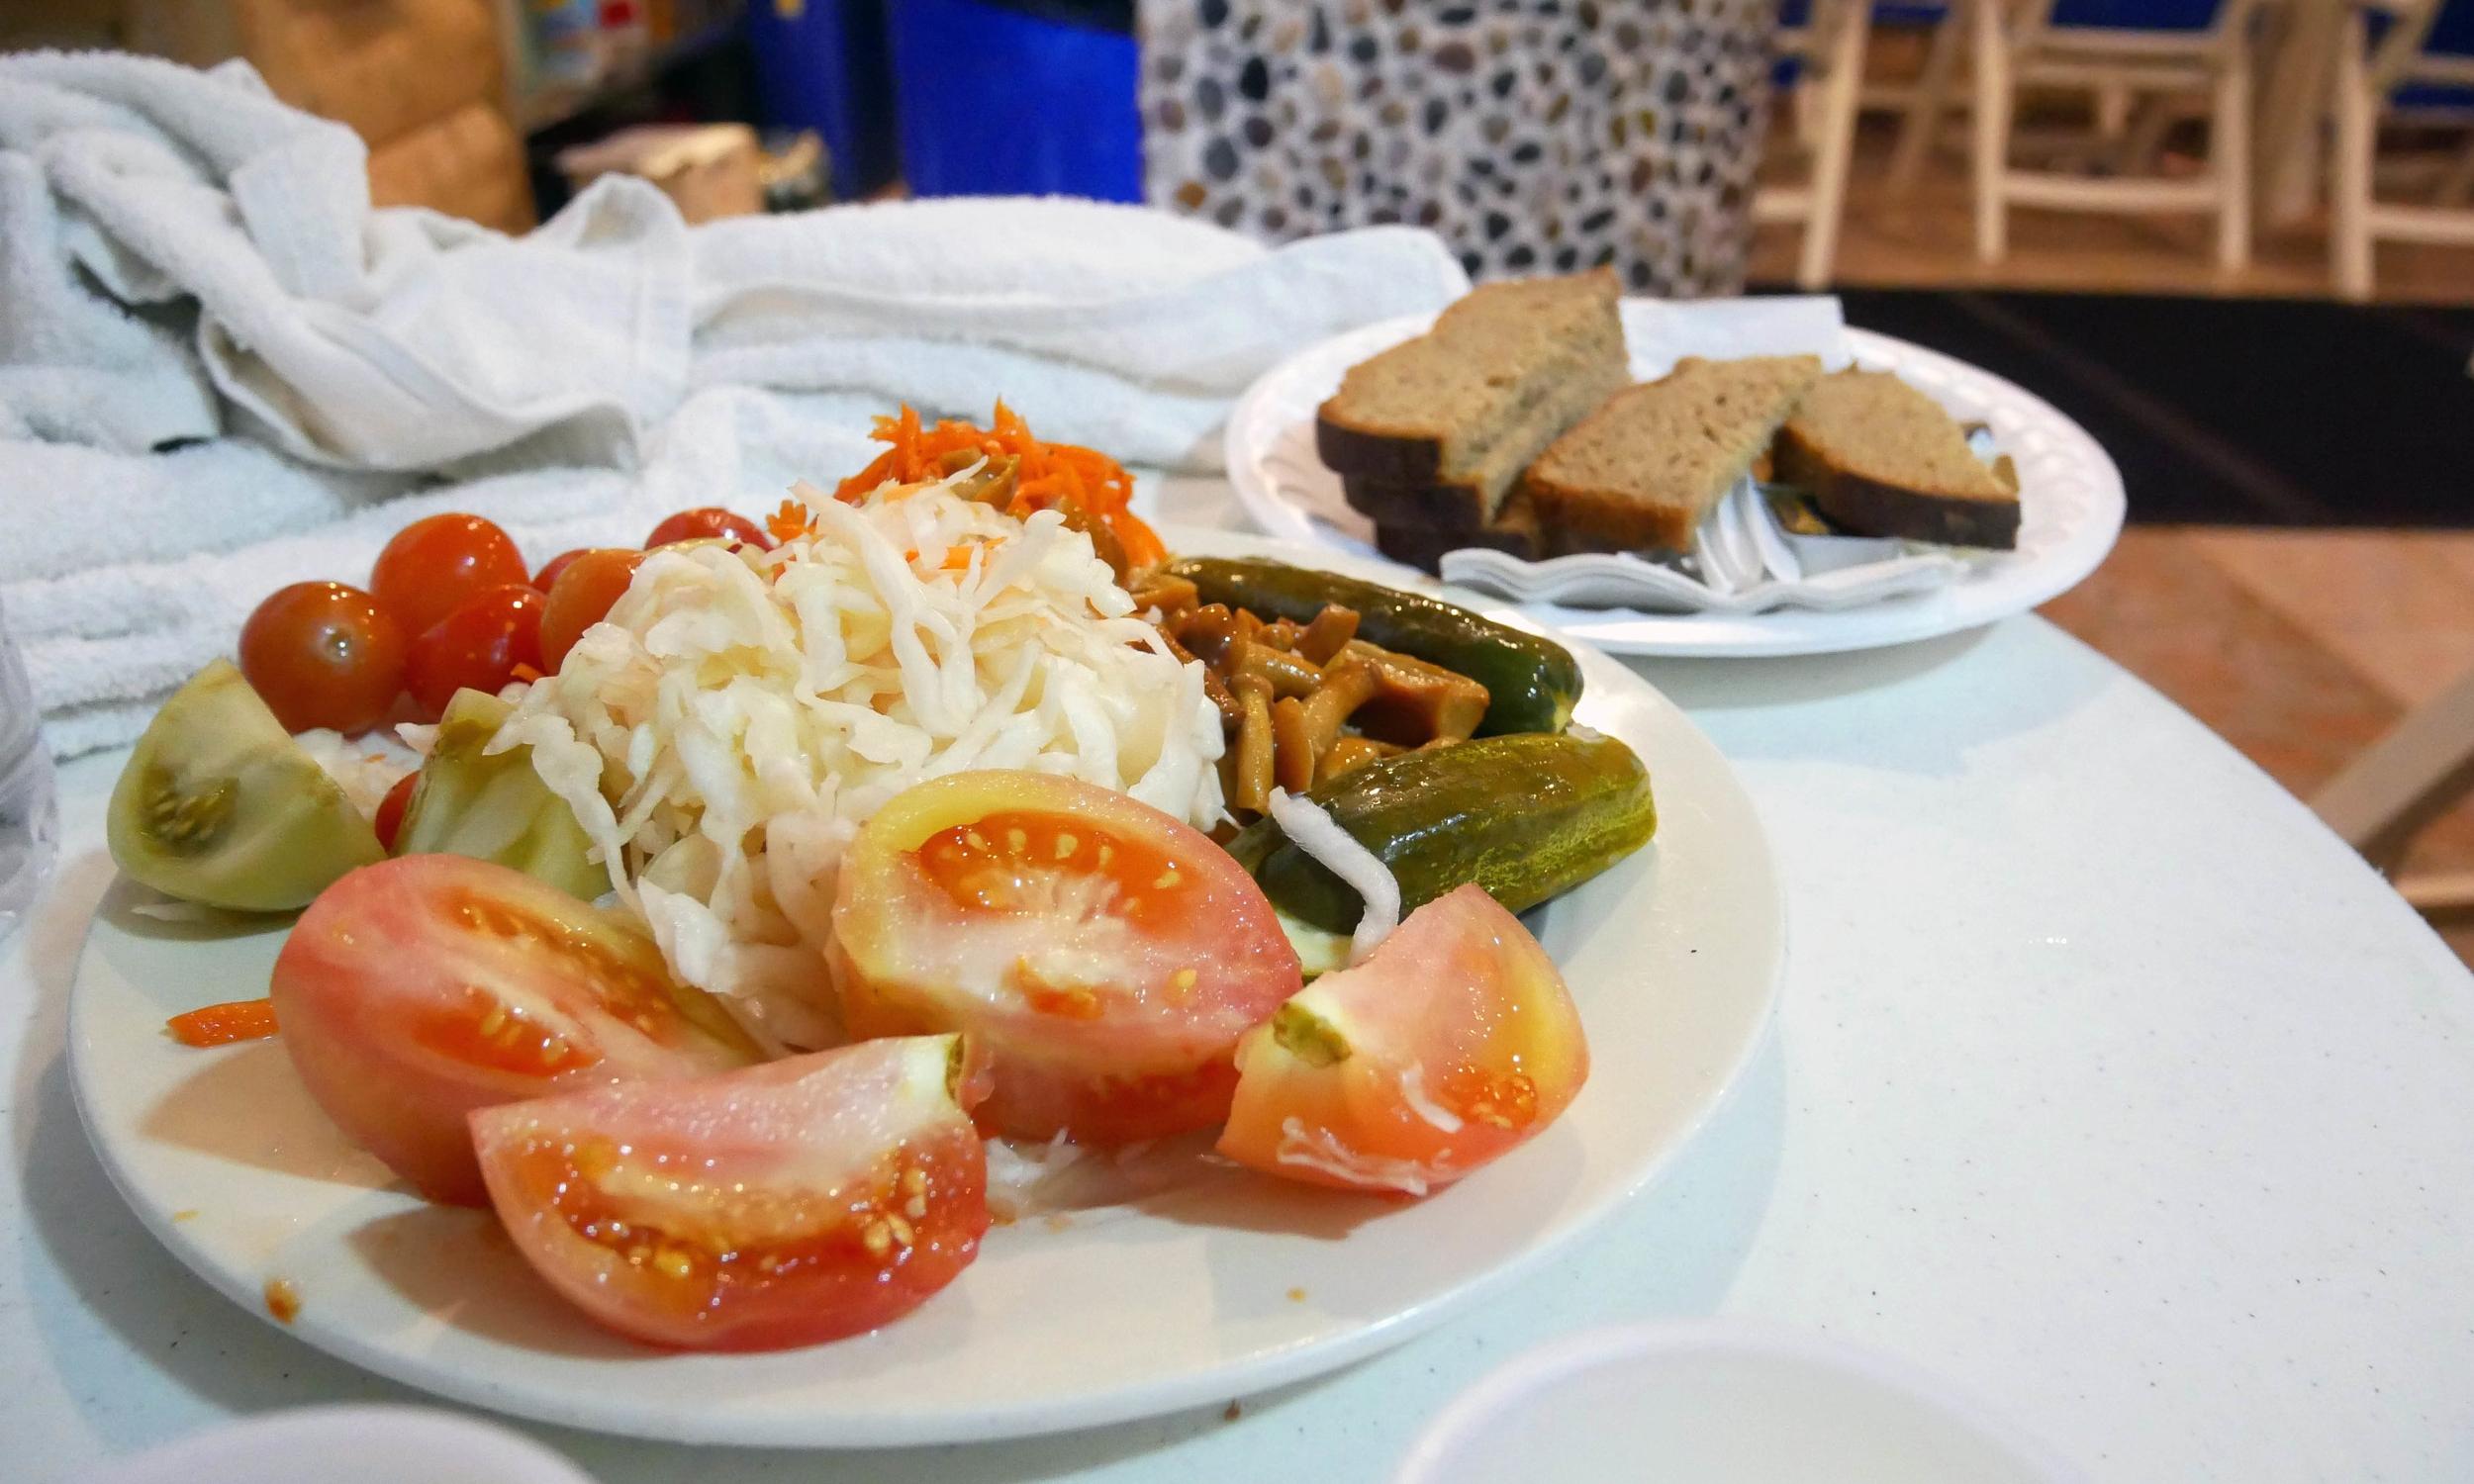 Pickled veggies are surprisingly delicious